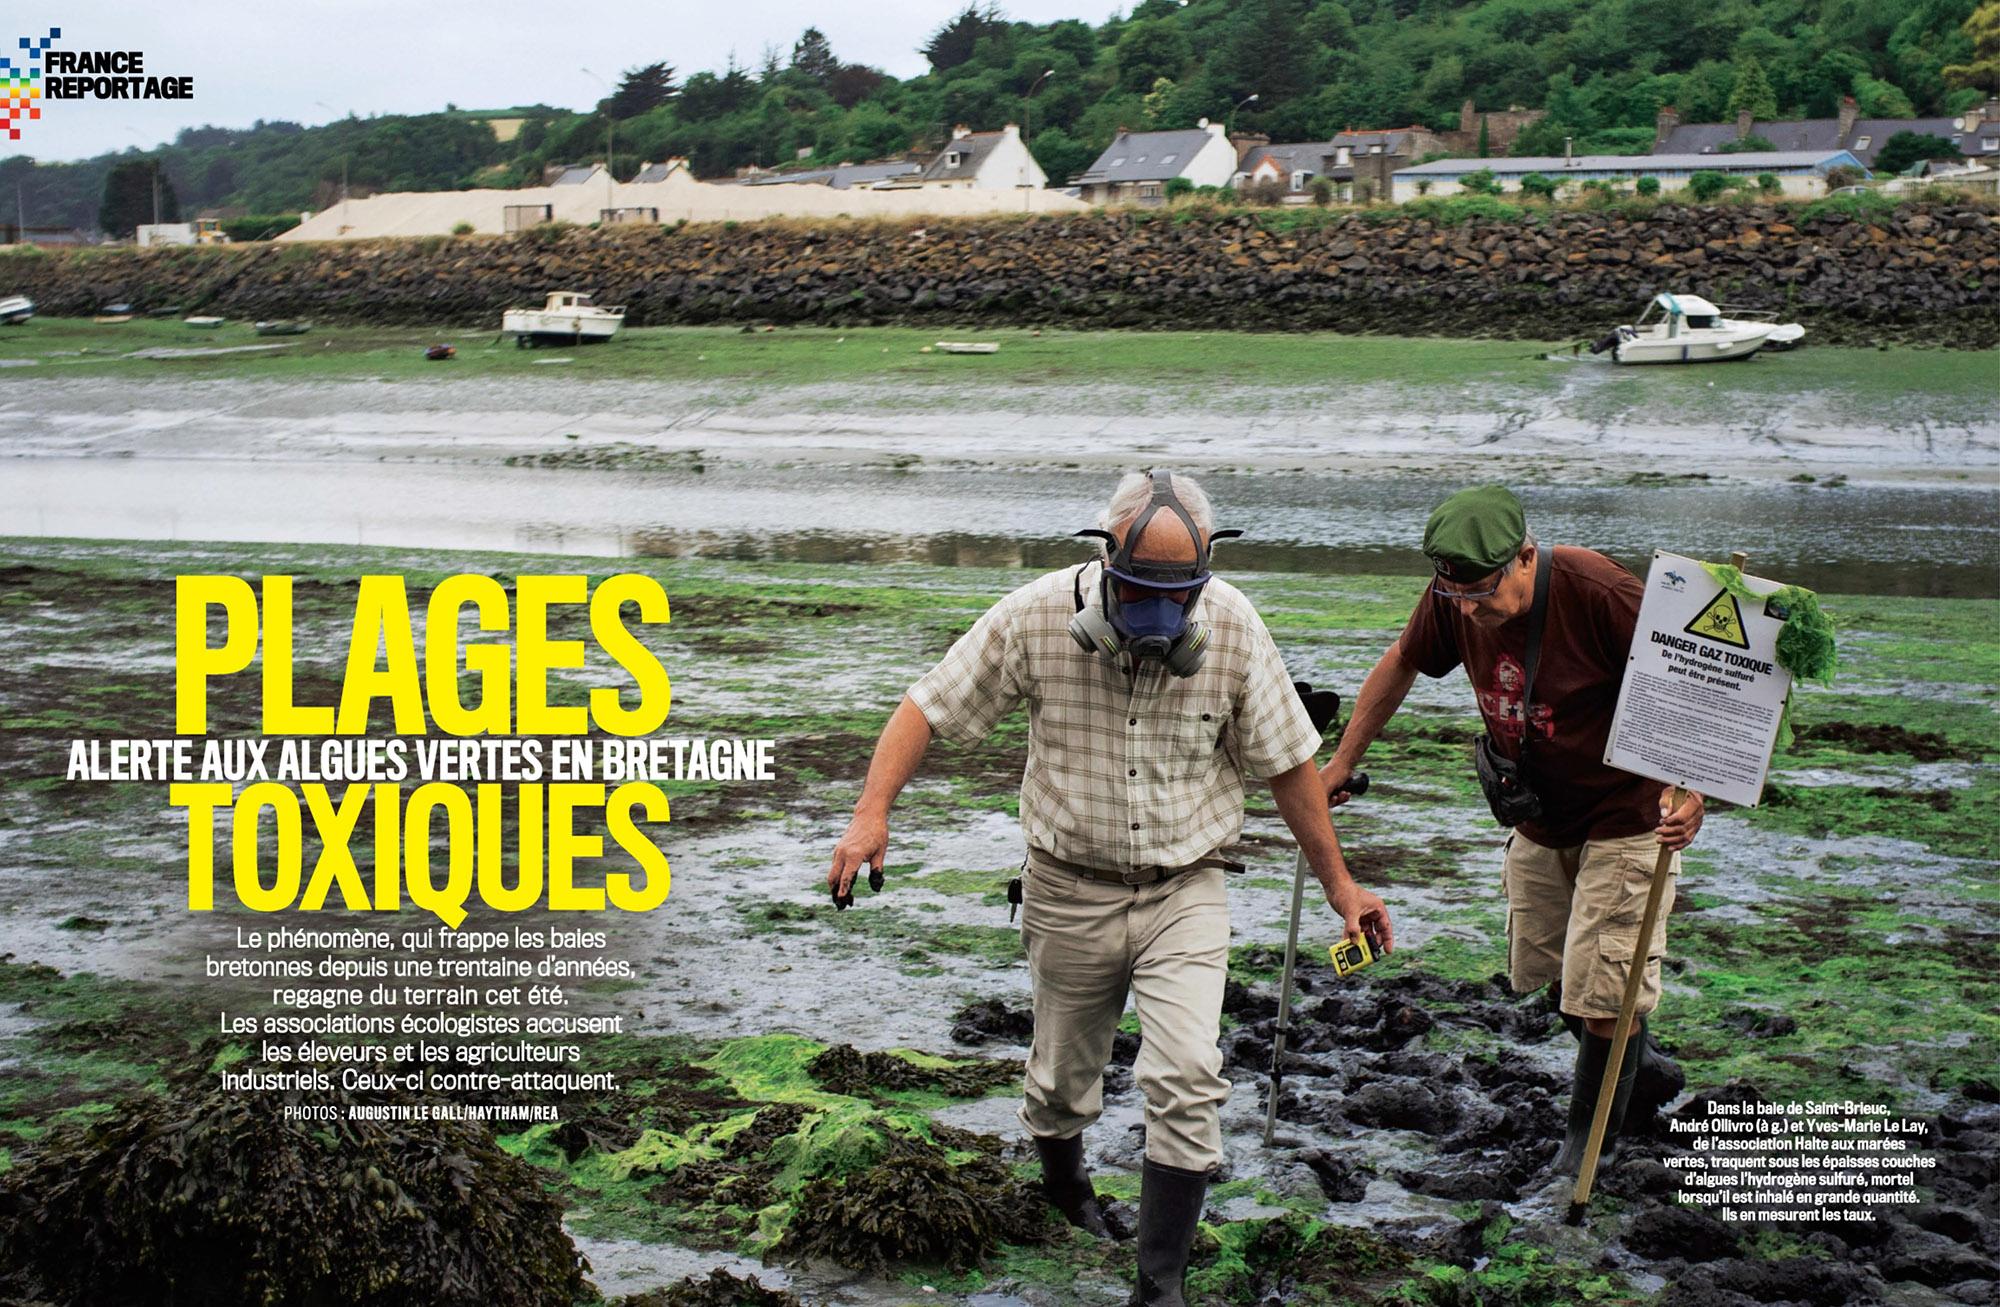 """Plages toxiques "" dans VSD. Aout 2017./""Toxics beaches"" in VSD. August 2017"